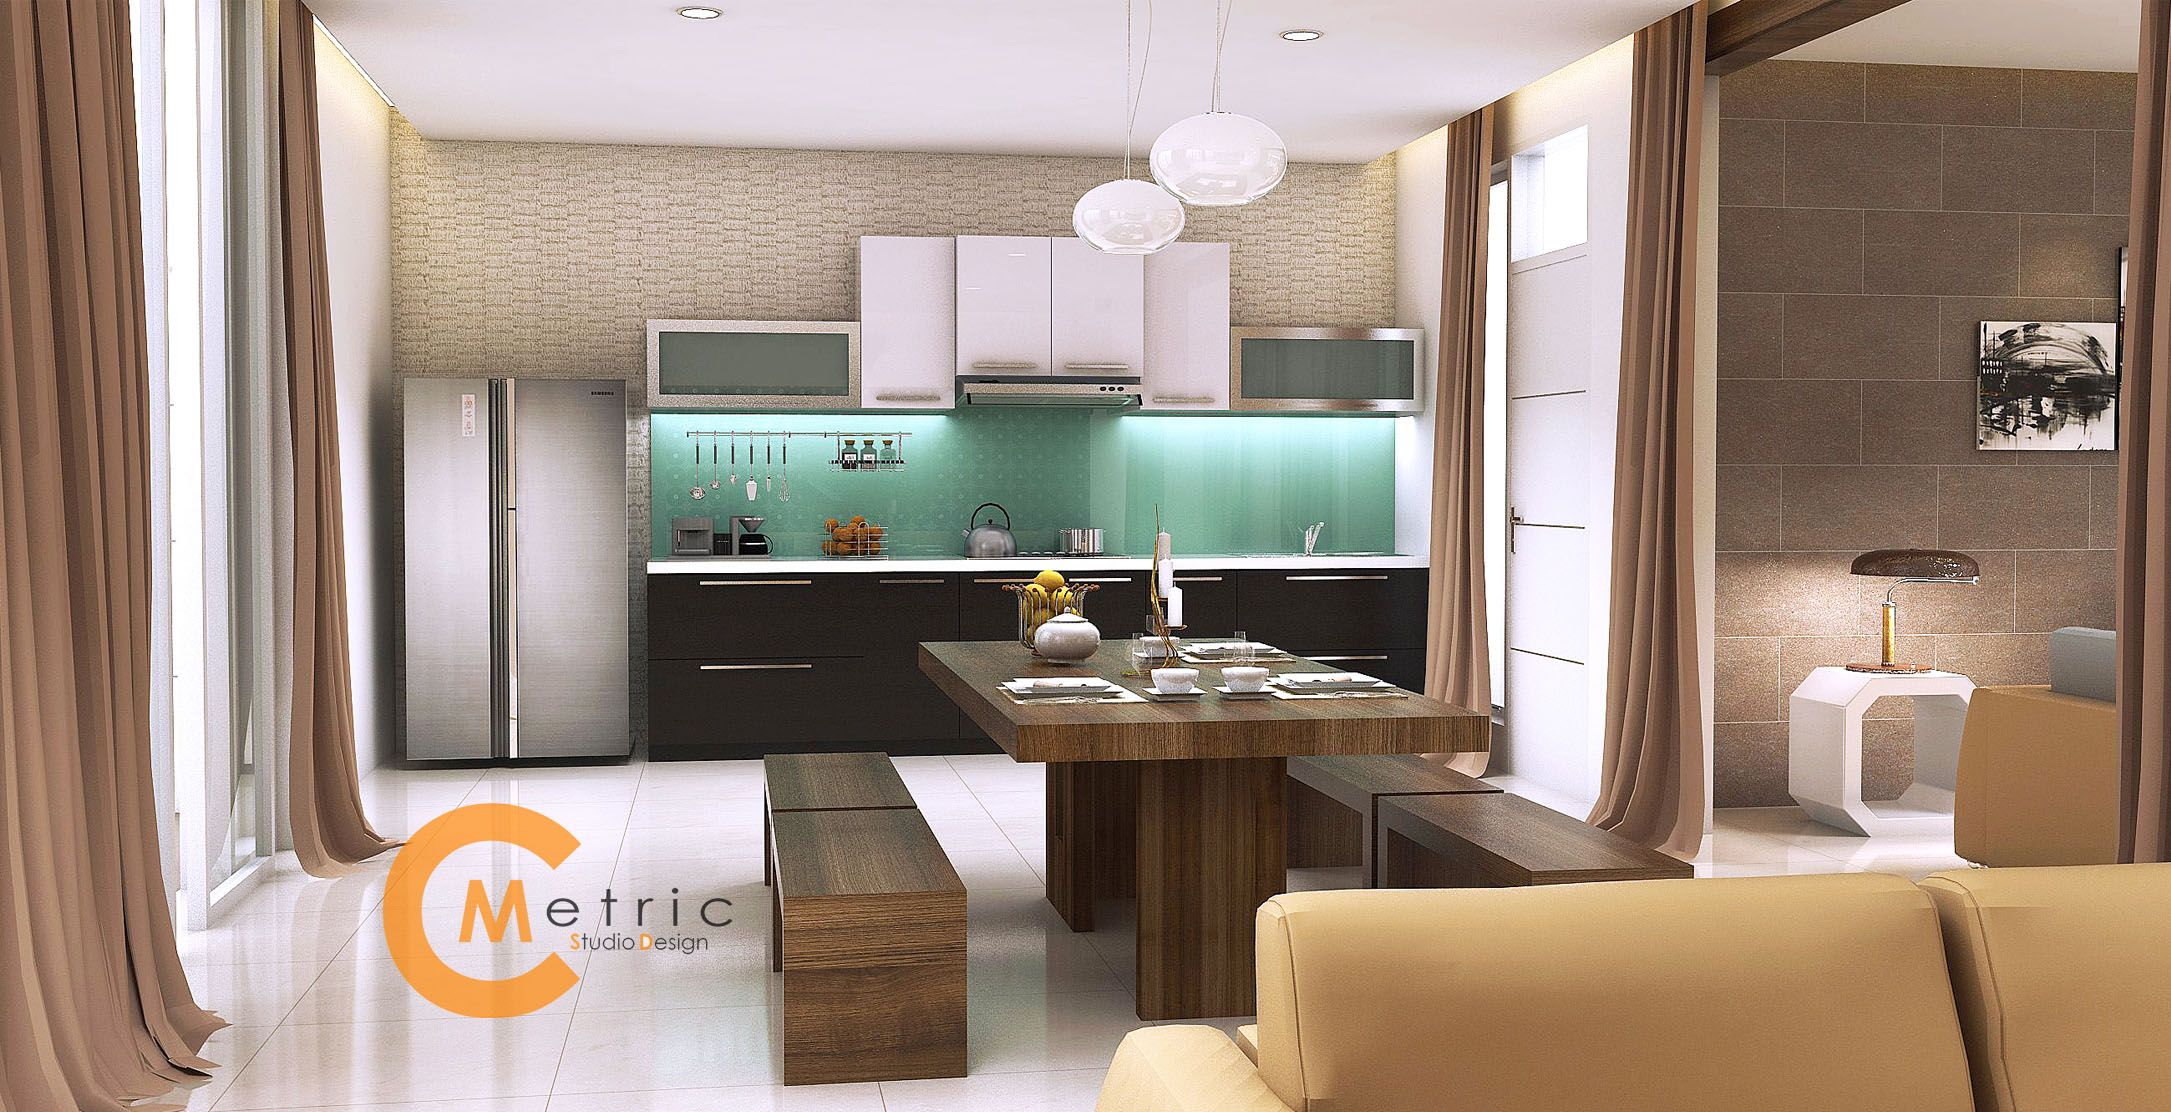 Jasa 3d Model Interior Furniture Desain Gambar Arsitekture Apartemen Kitchen Set Mebel Dan Animasi